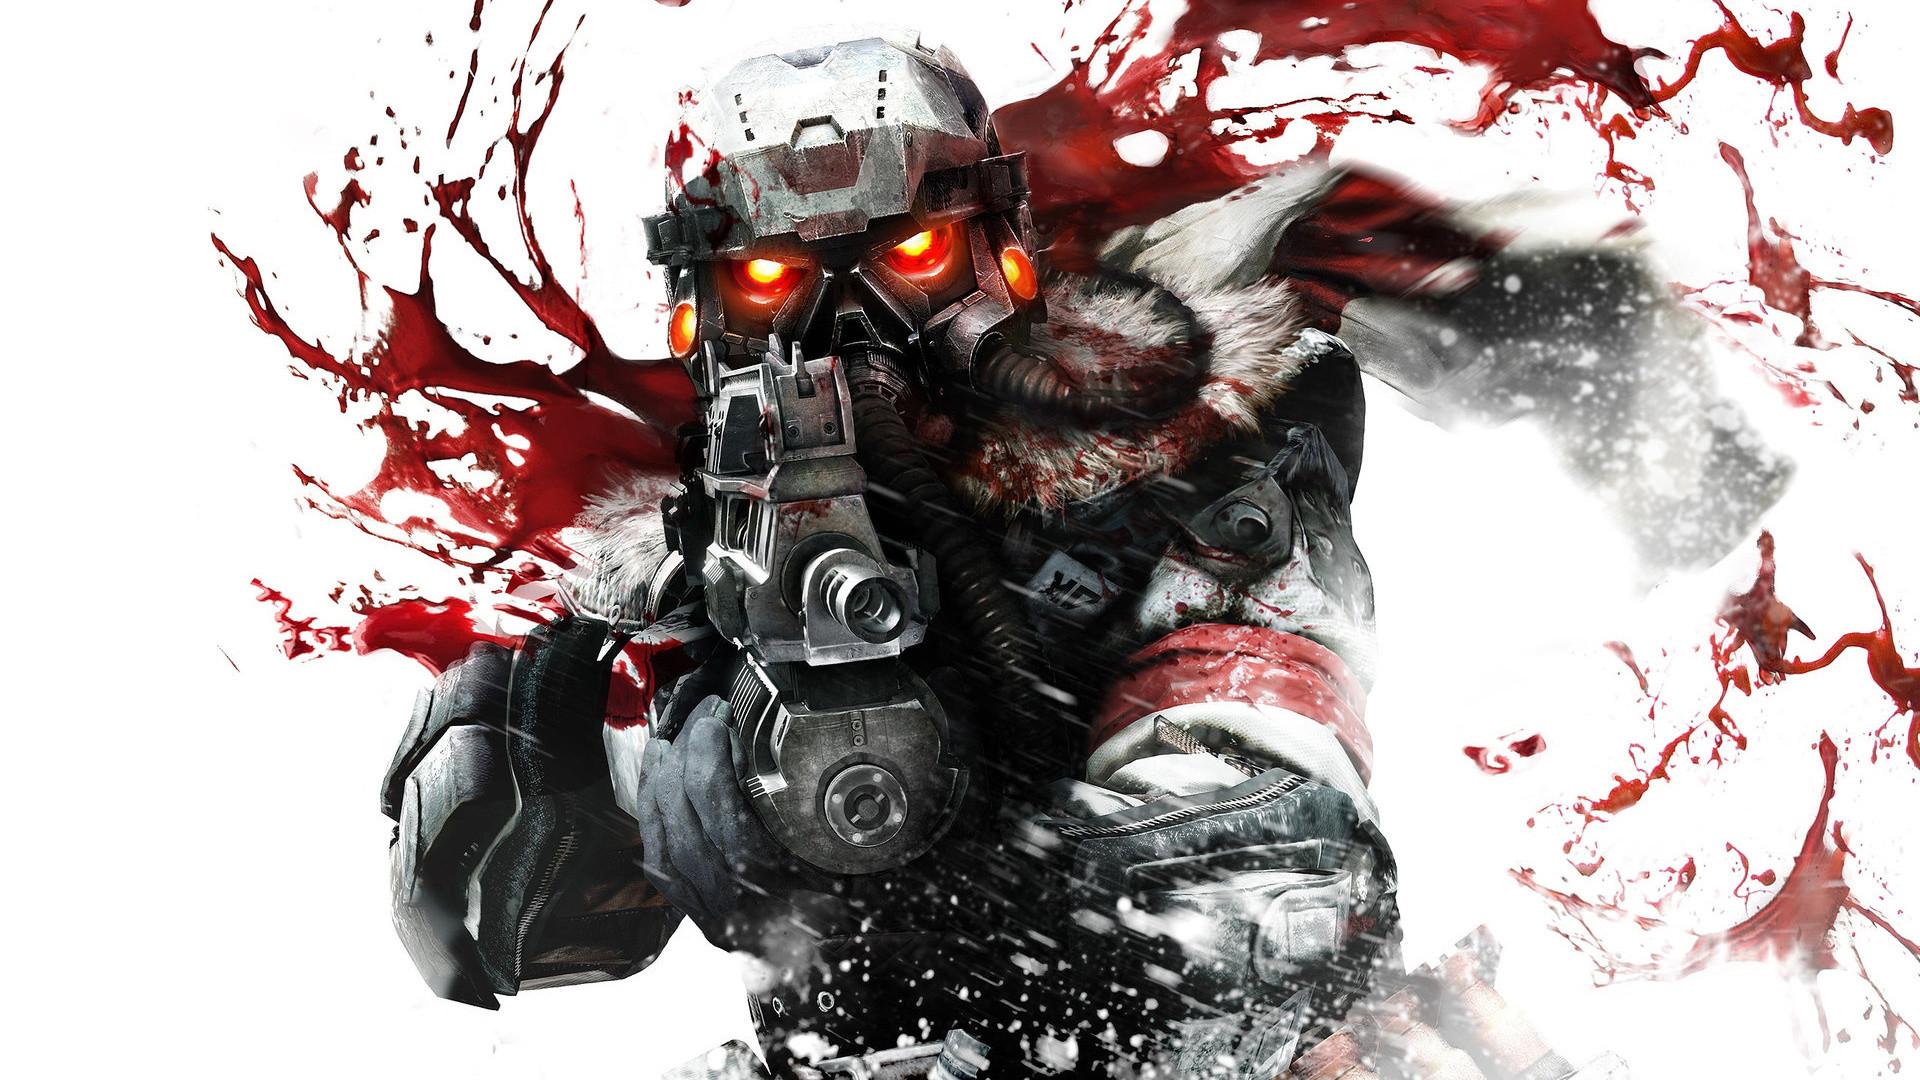 gaming pc wallpaper 73 images